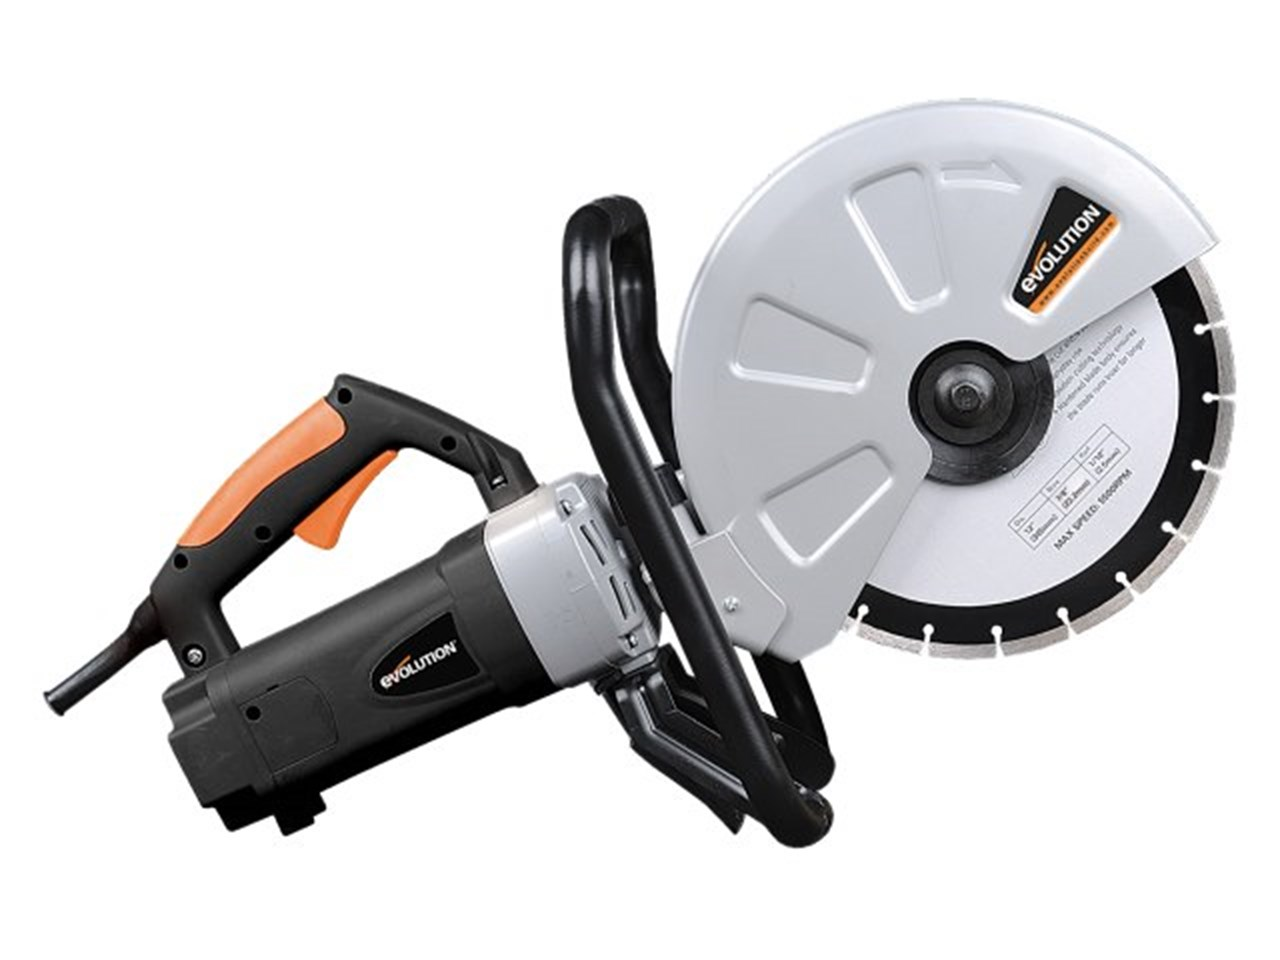 Evolution Evoedc 305mm Electric Disc Cutter 2400w 240v